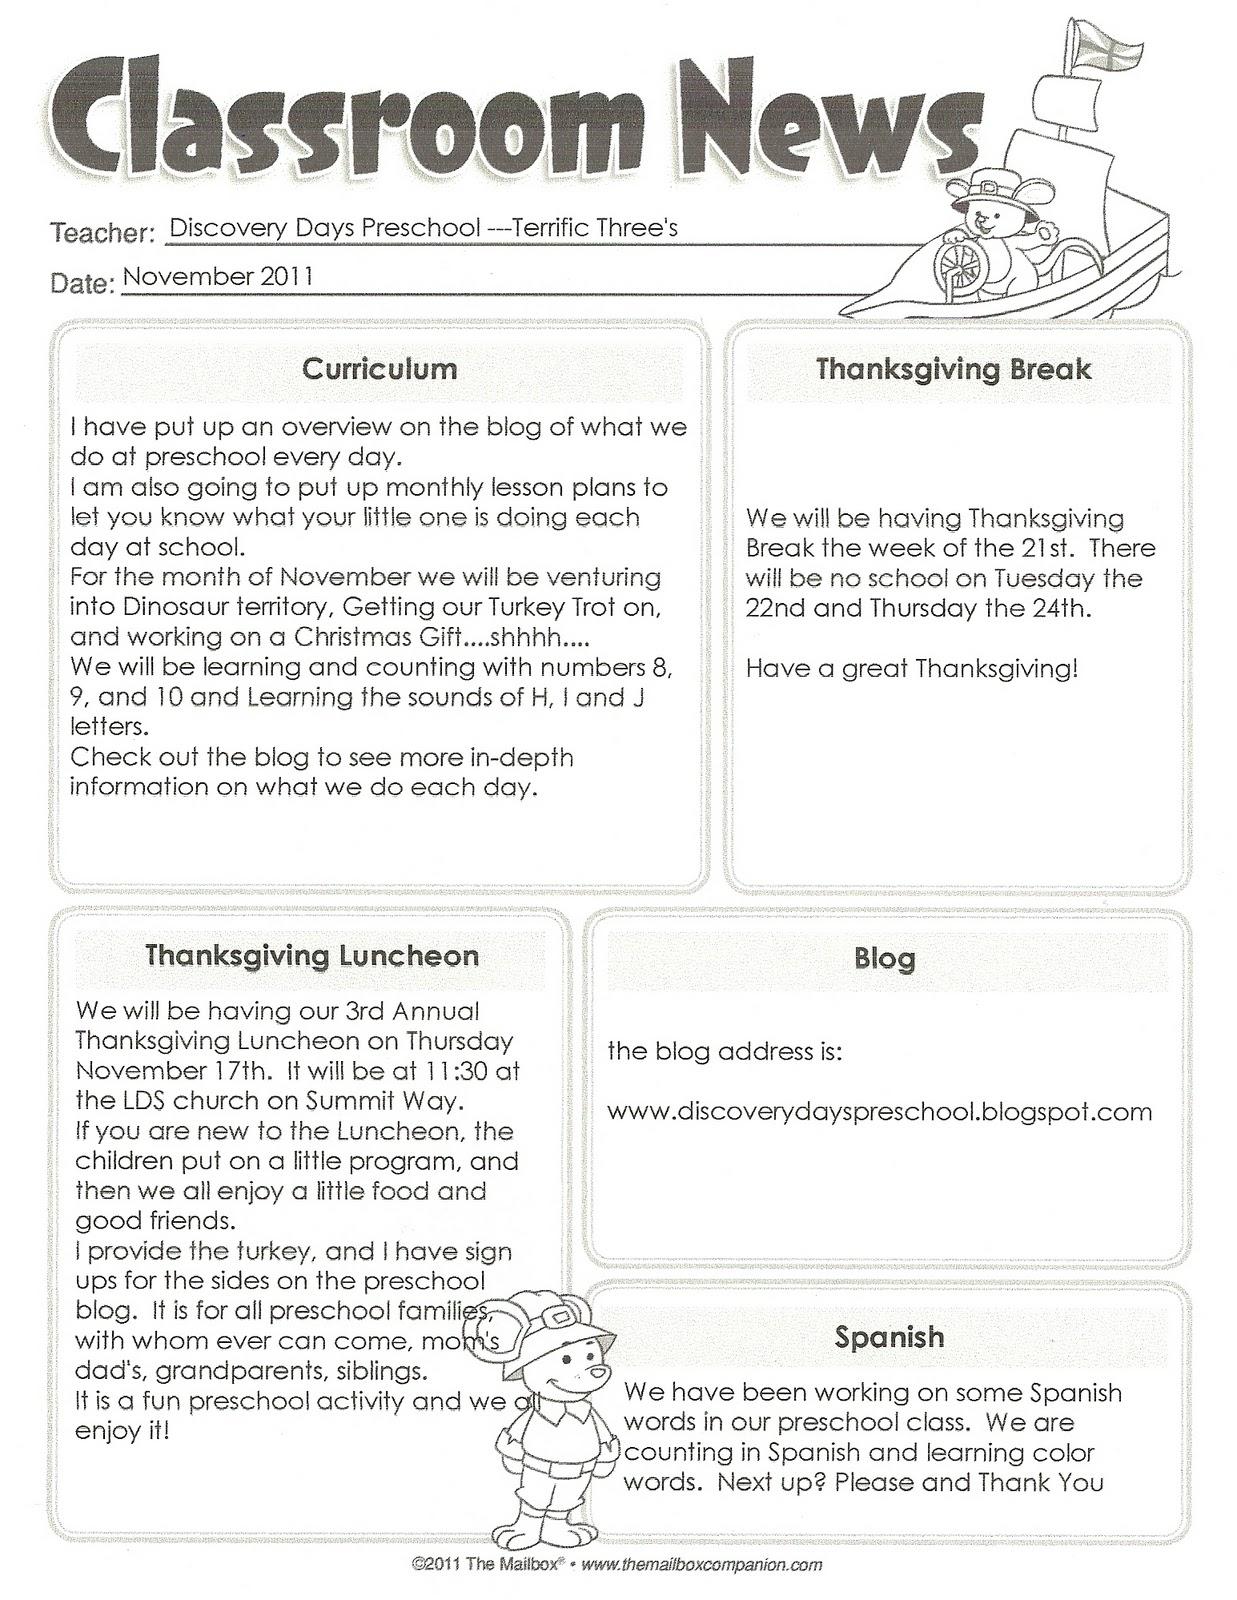 November Kindergarten Calendar : Discovery days preschool november calendar and newsletter